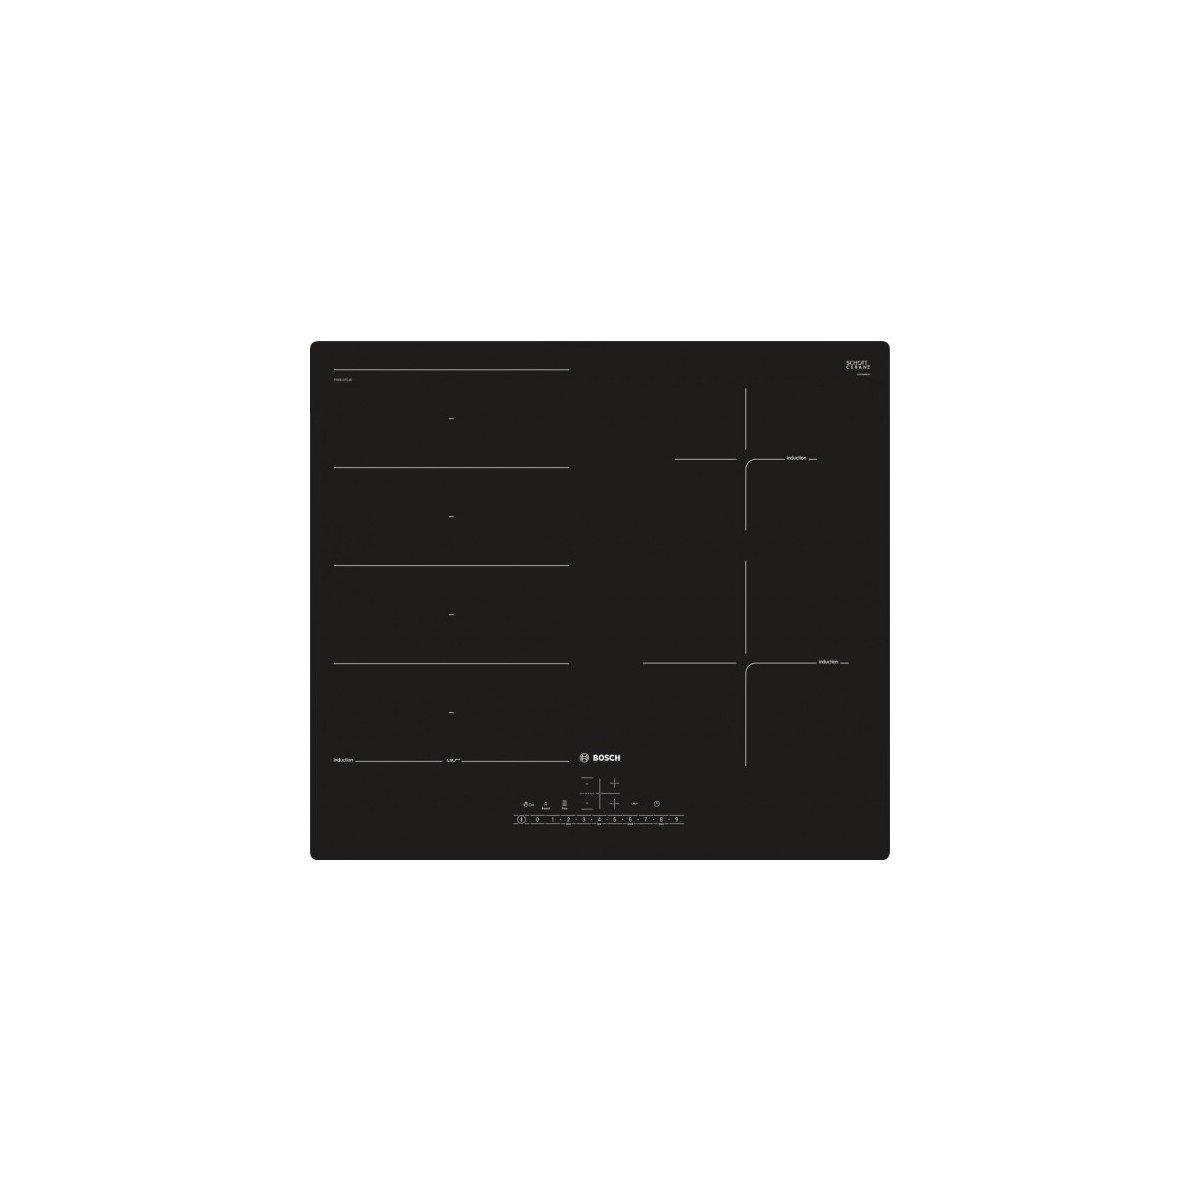 Bosch pxe611fc1e placas de vitrocerámica: Amazon.es: Grandes ...